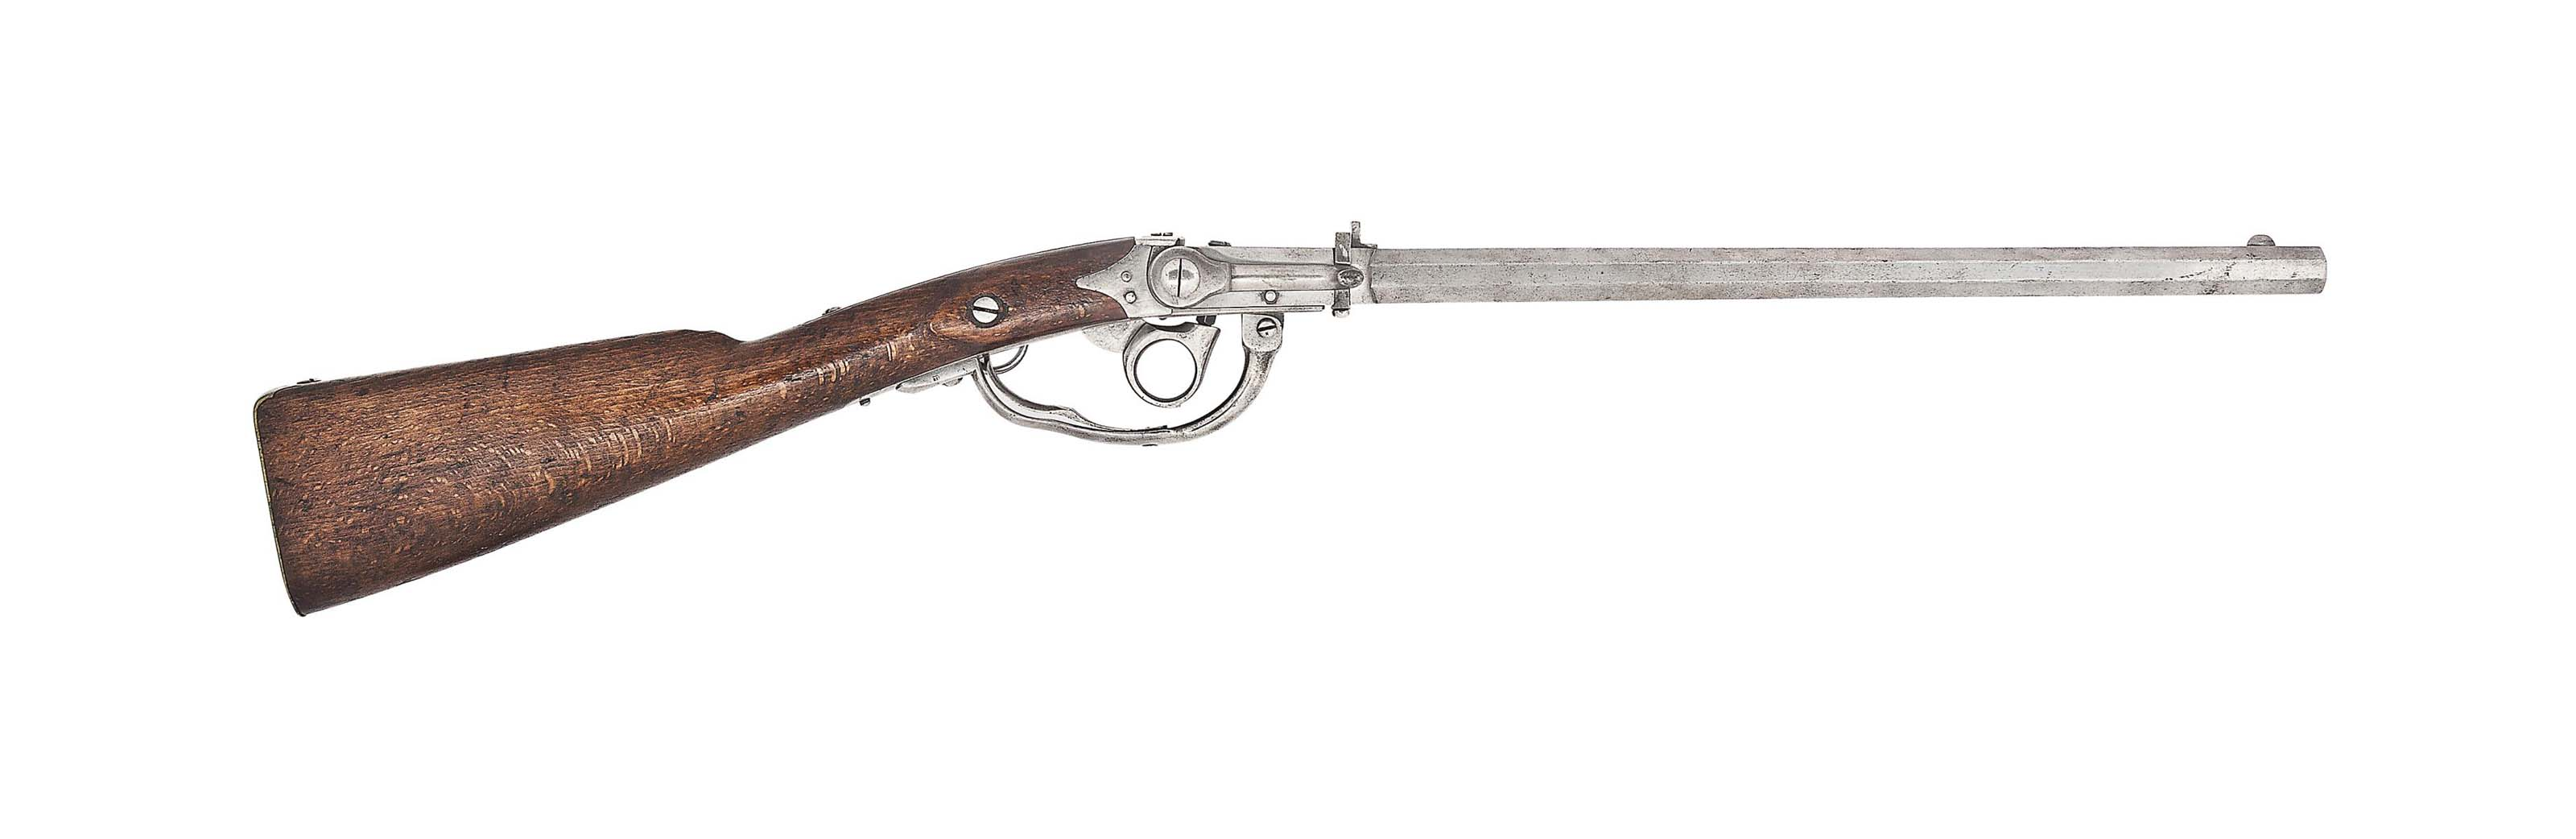 A RARE DANISH 11mm LOBNITZ PAT